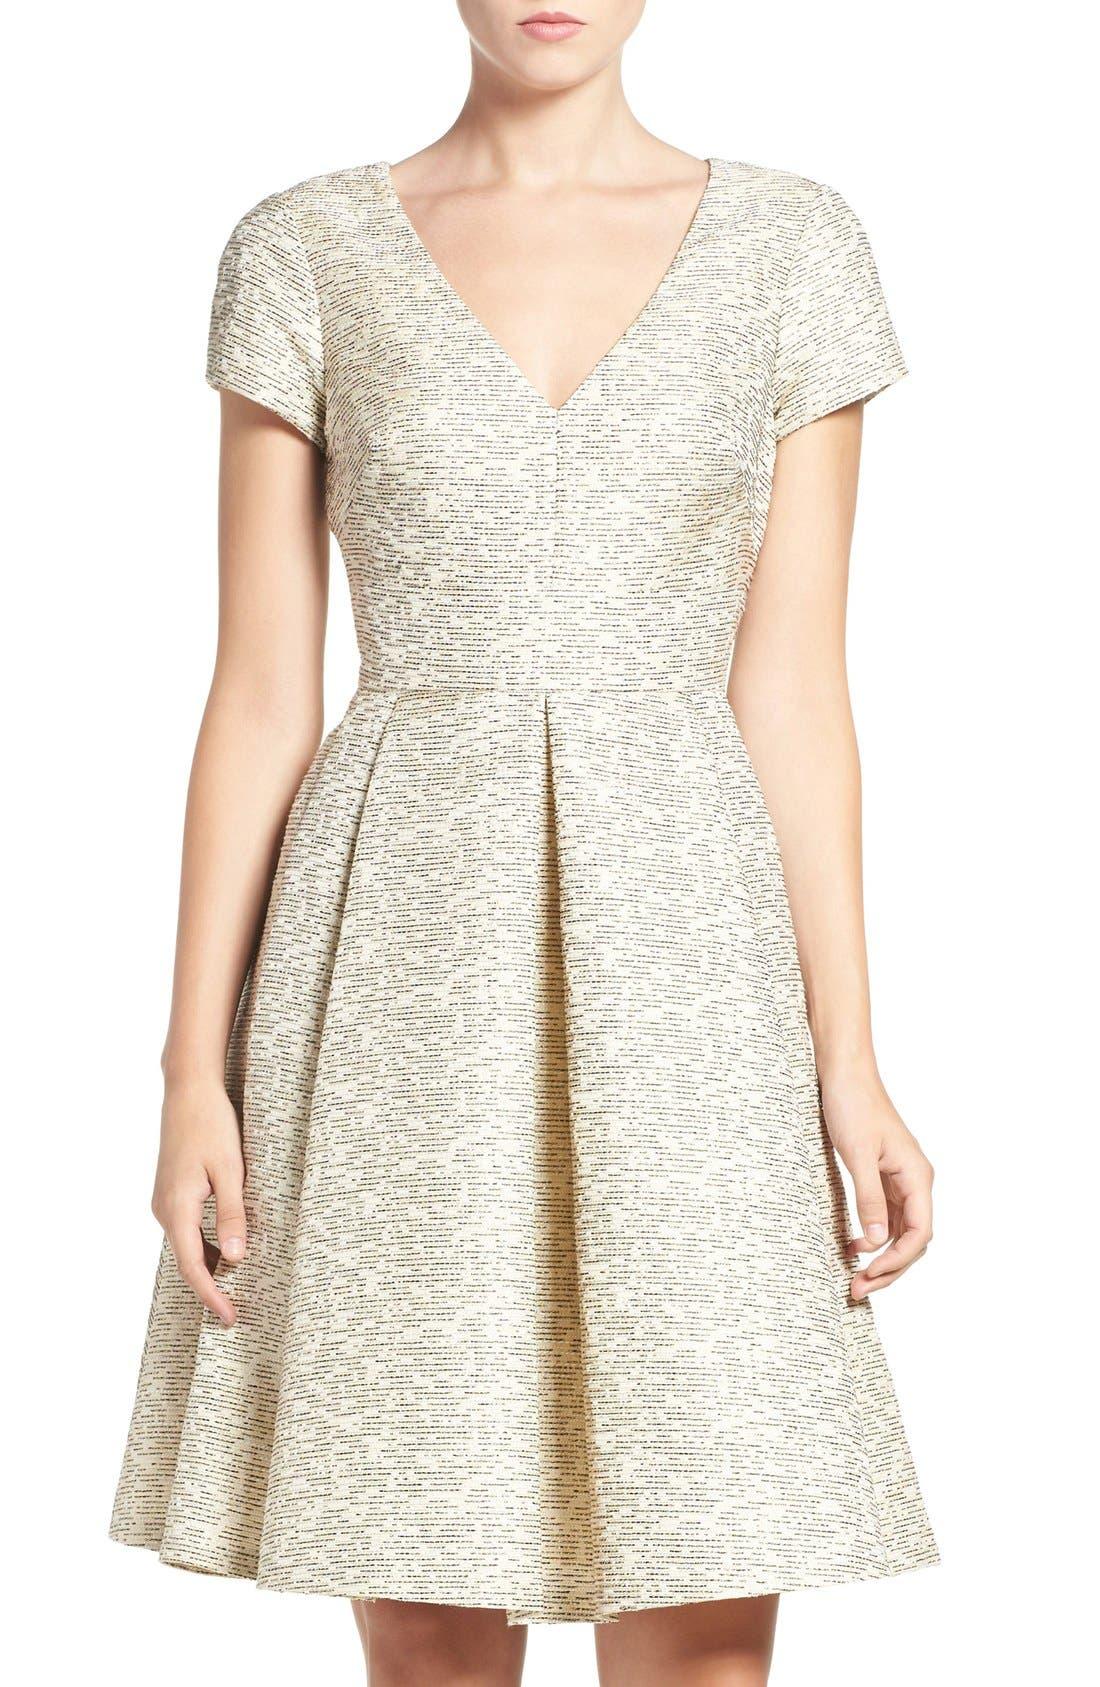 Main Image - Eliza J Metallic Jacquard Fit & Flare Dress